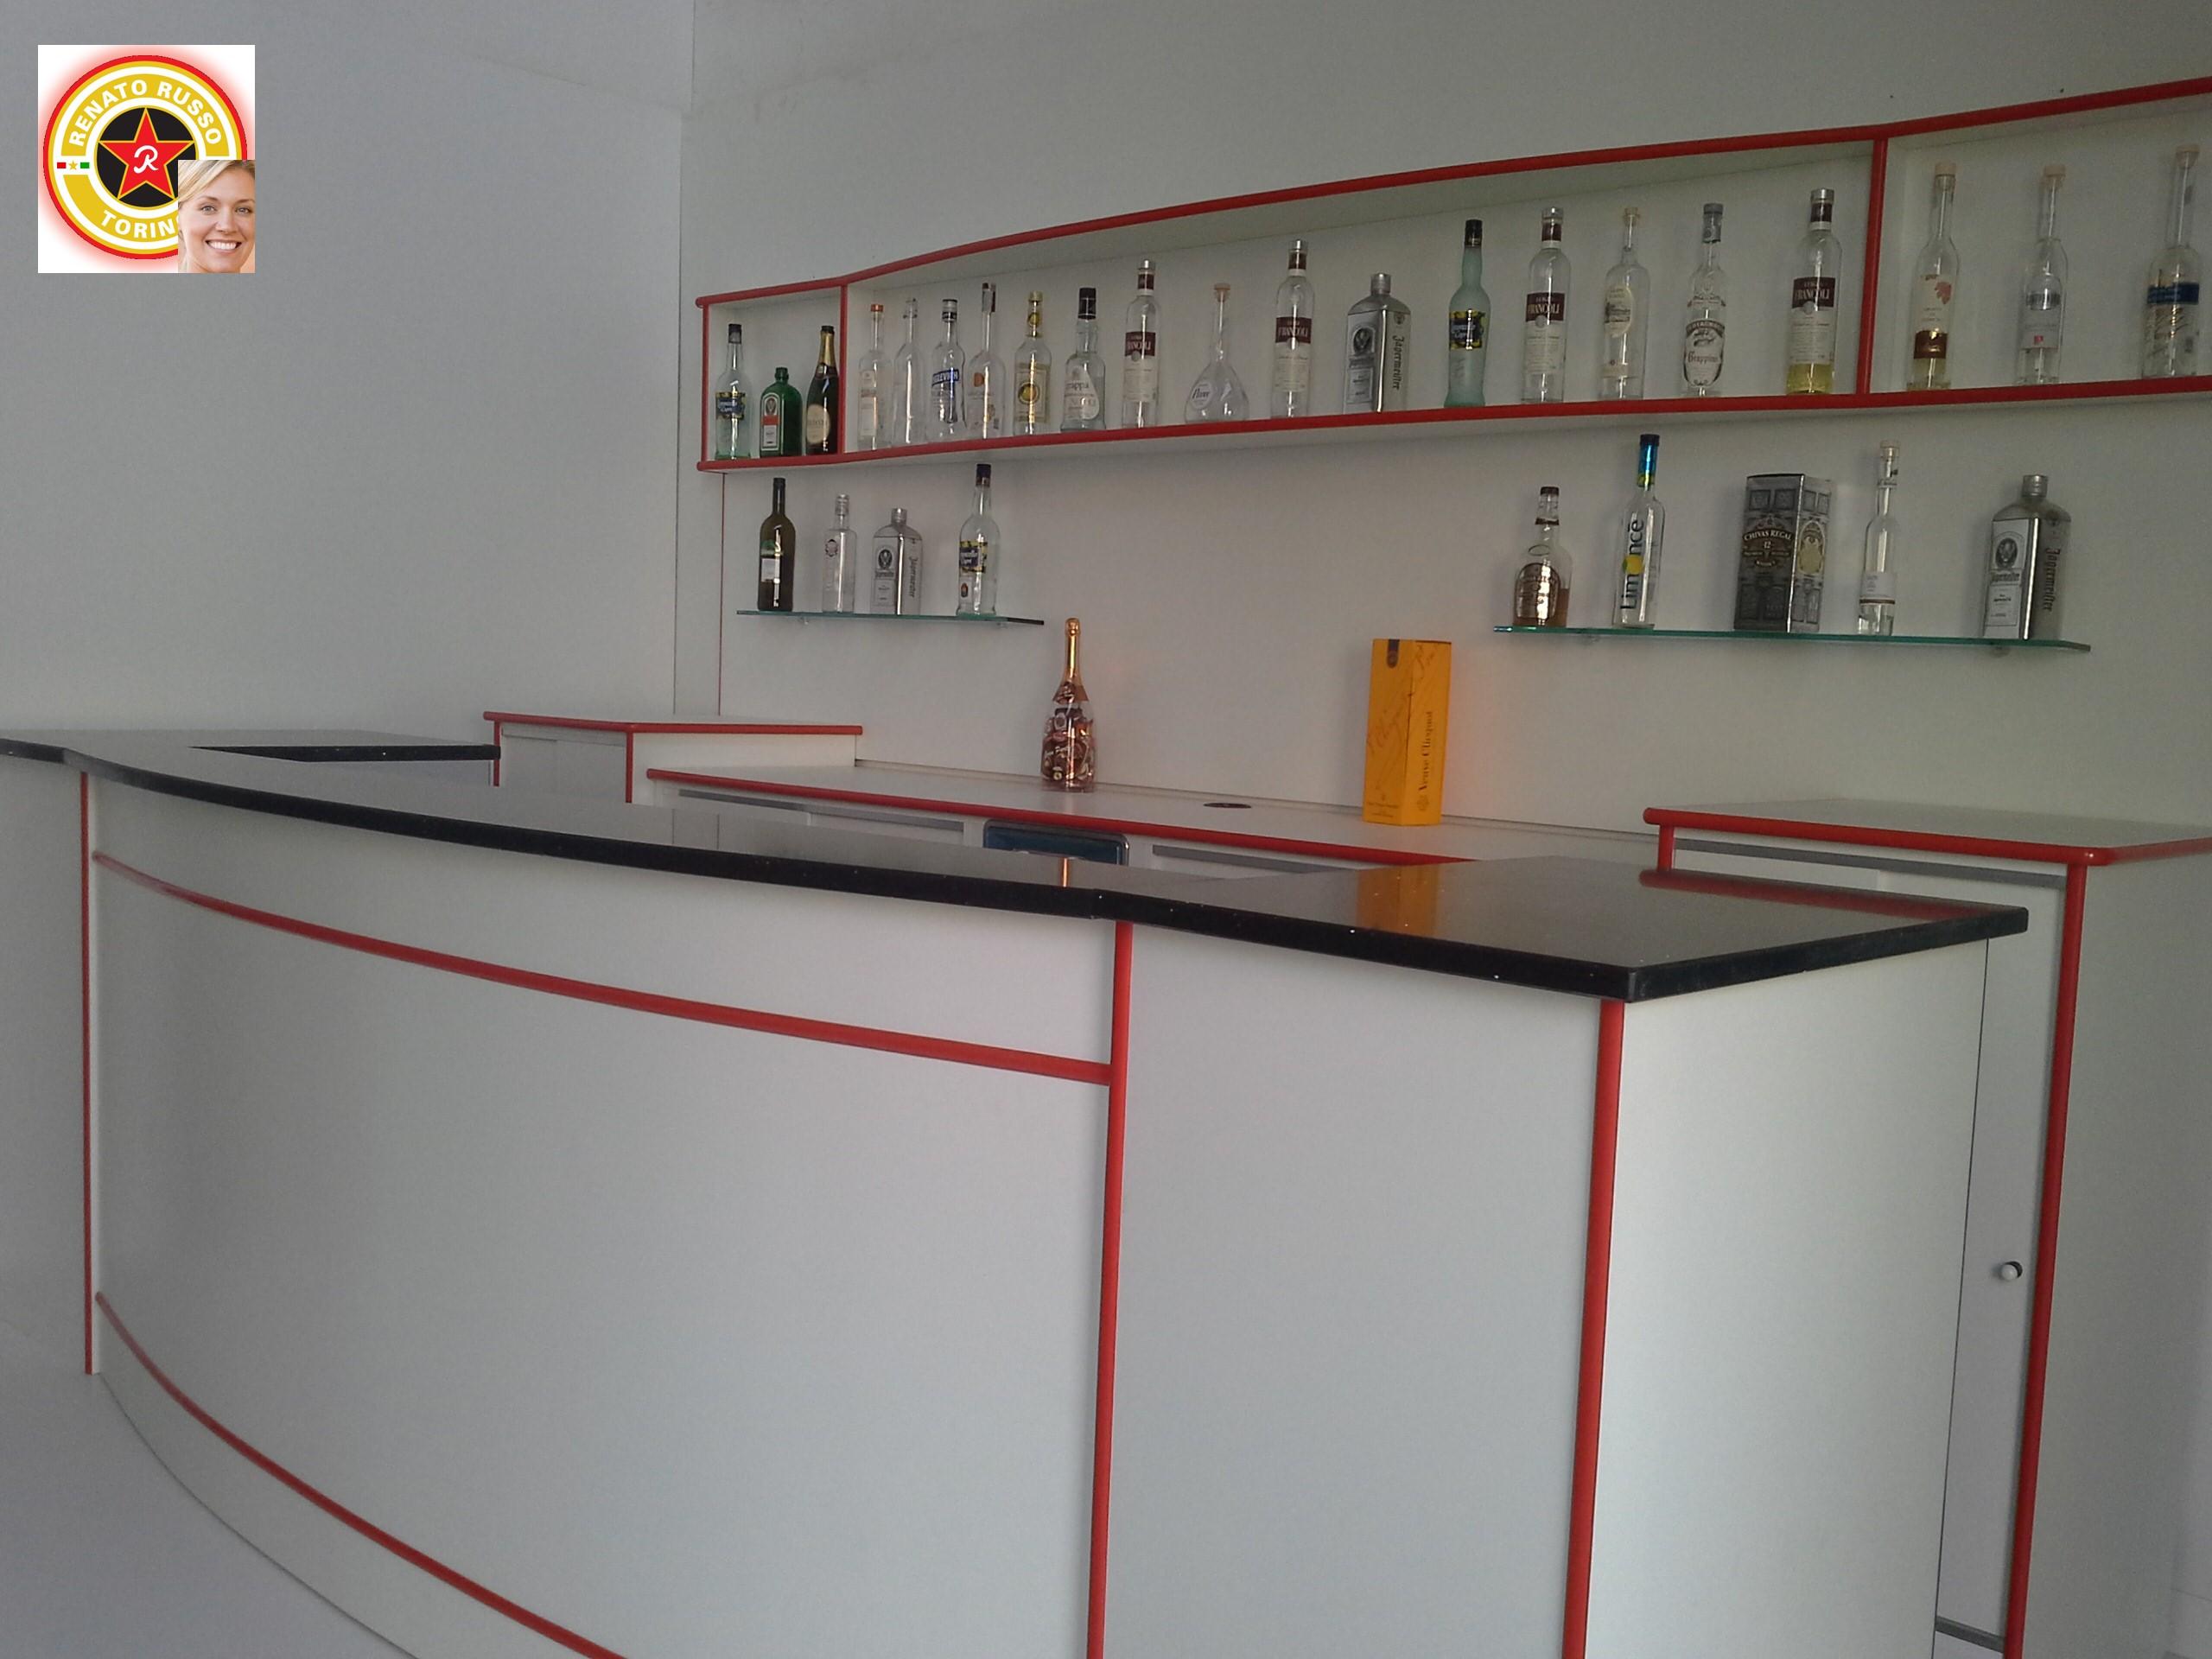 Banchi bar compra in fabbrica banconi bar produttori di for Banconi bar usati roma